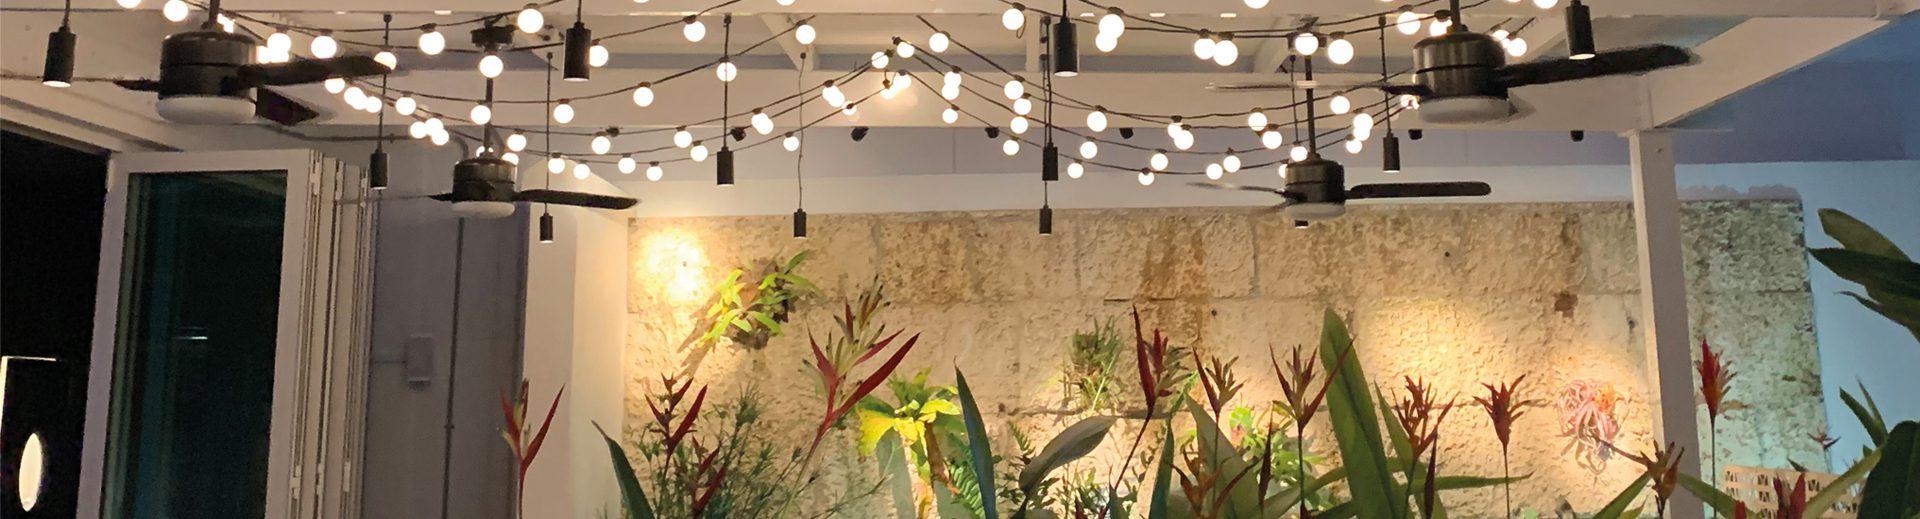 Florida Restaurant_Banner